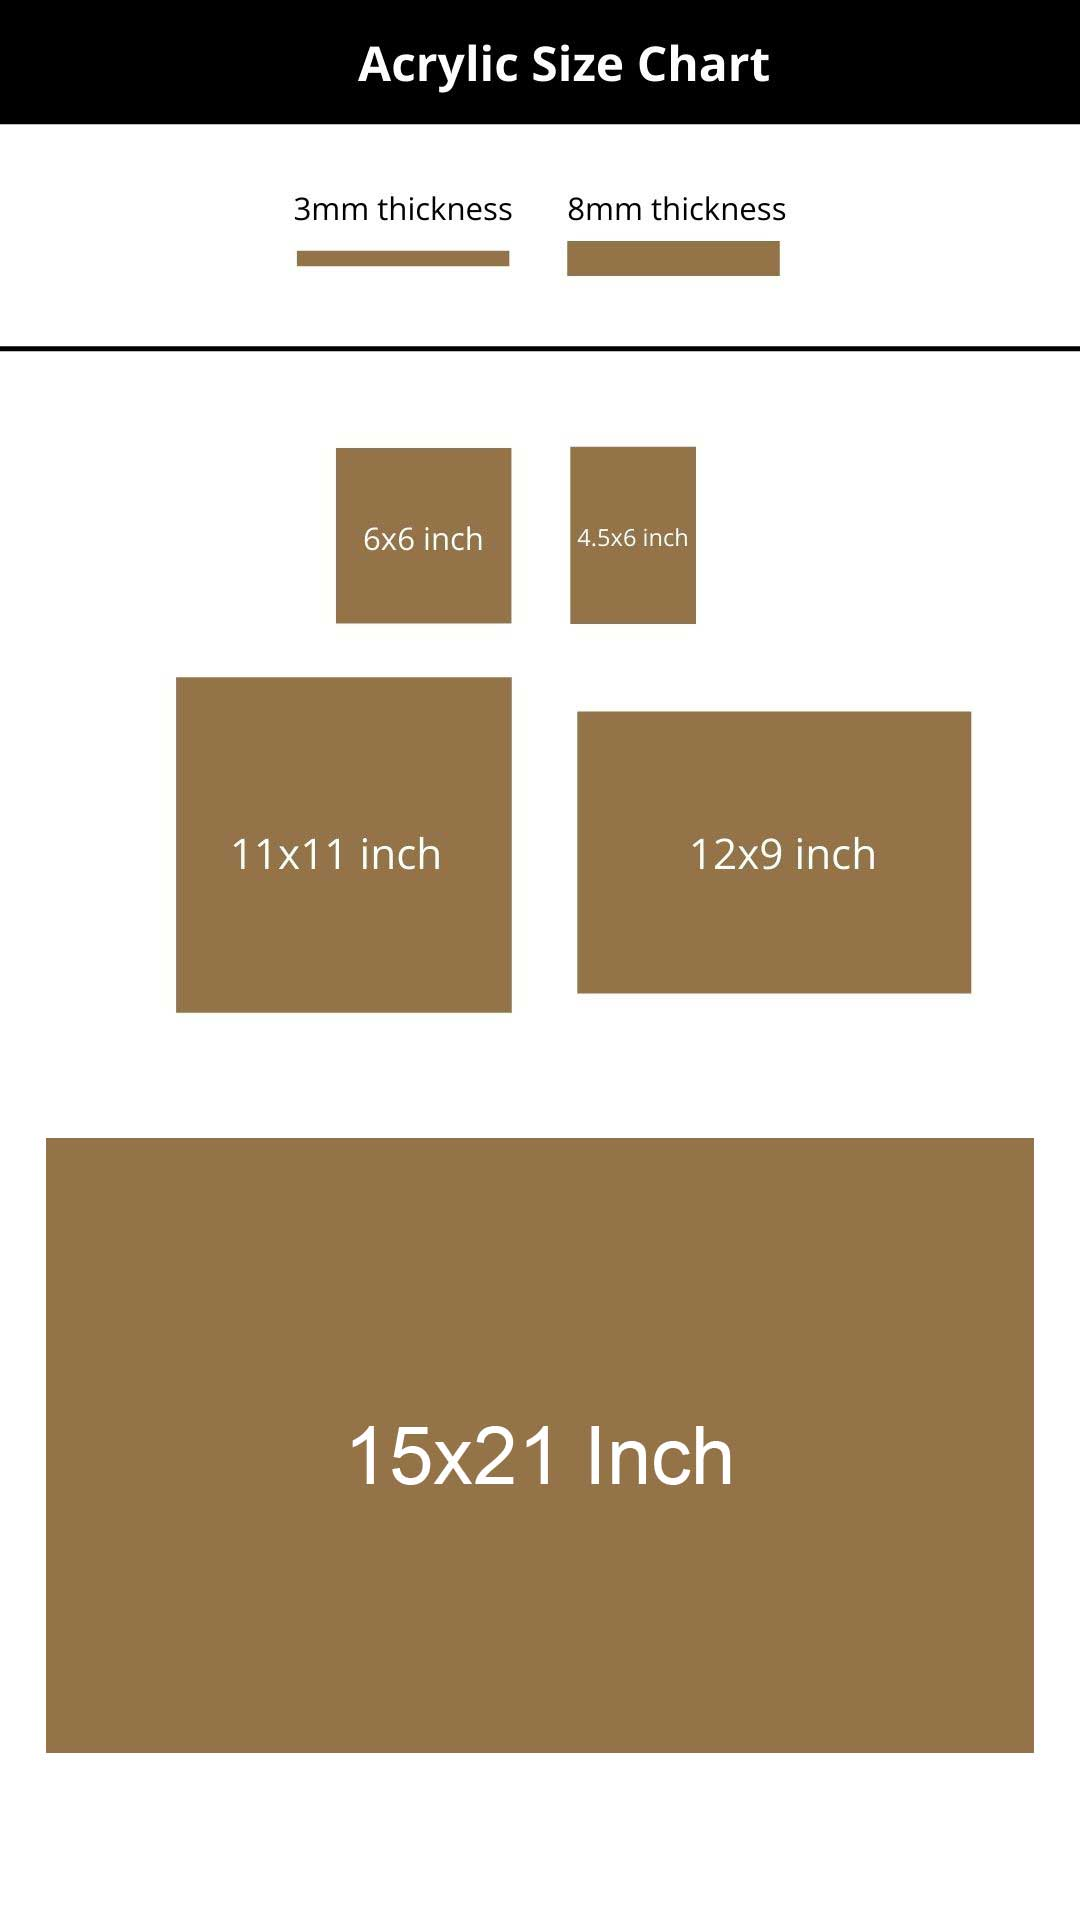 Acrylic Size Chart